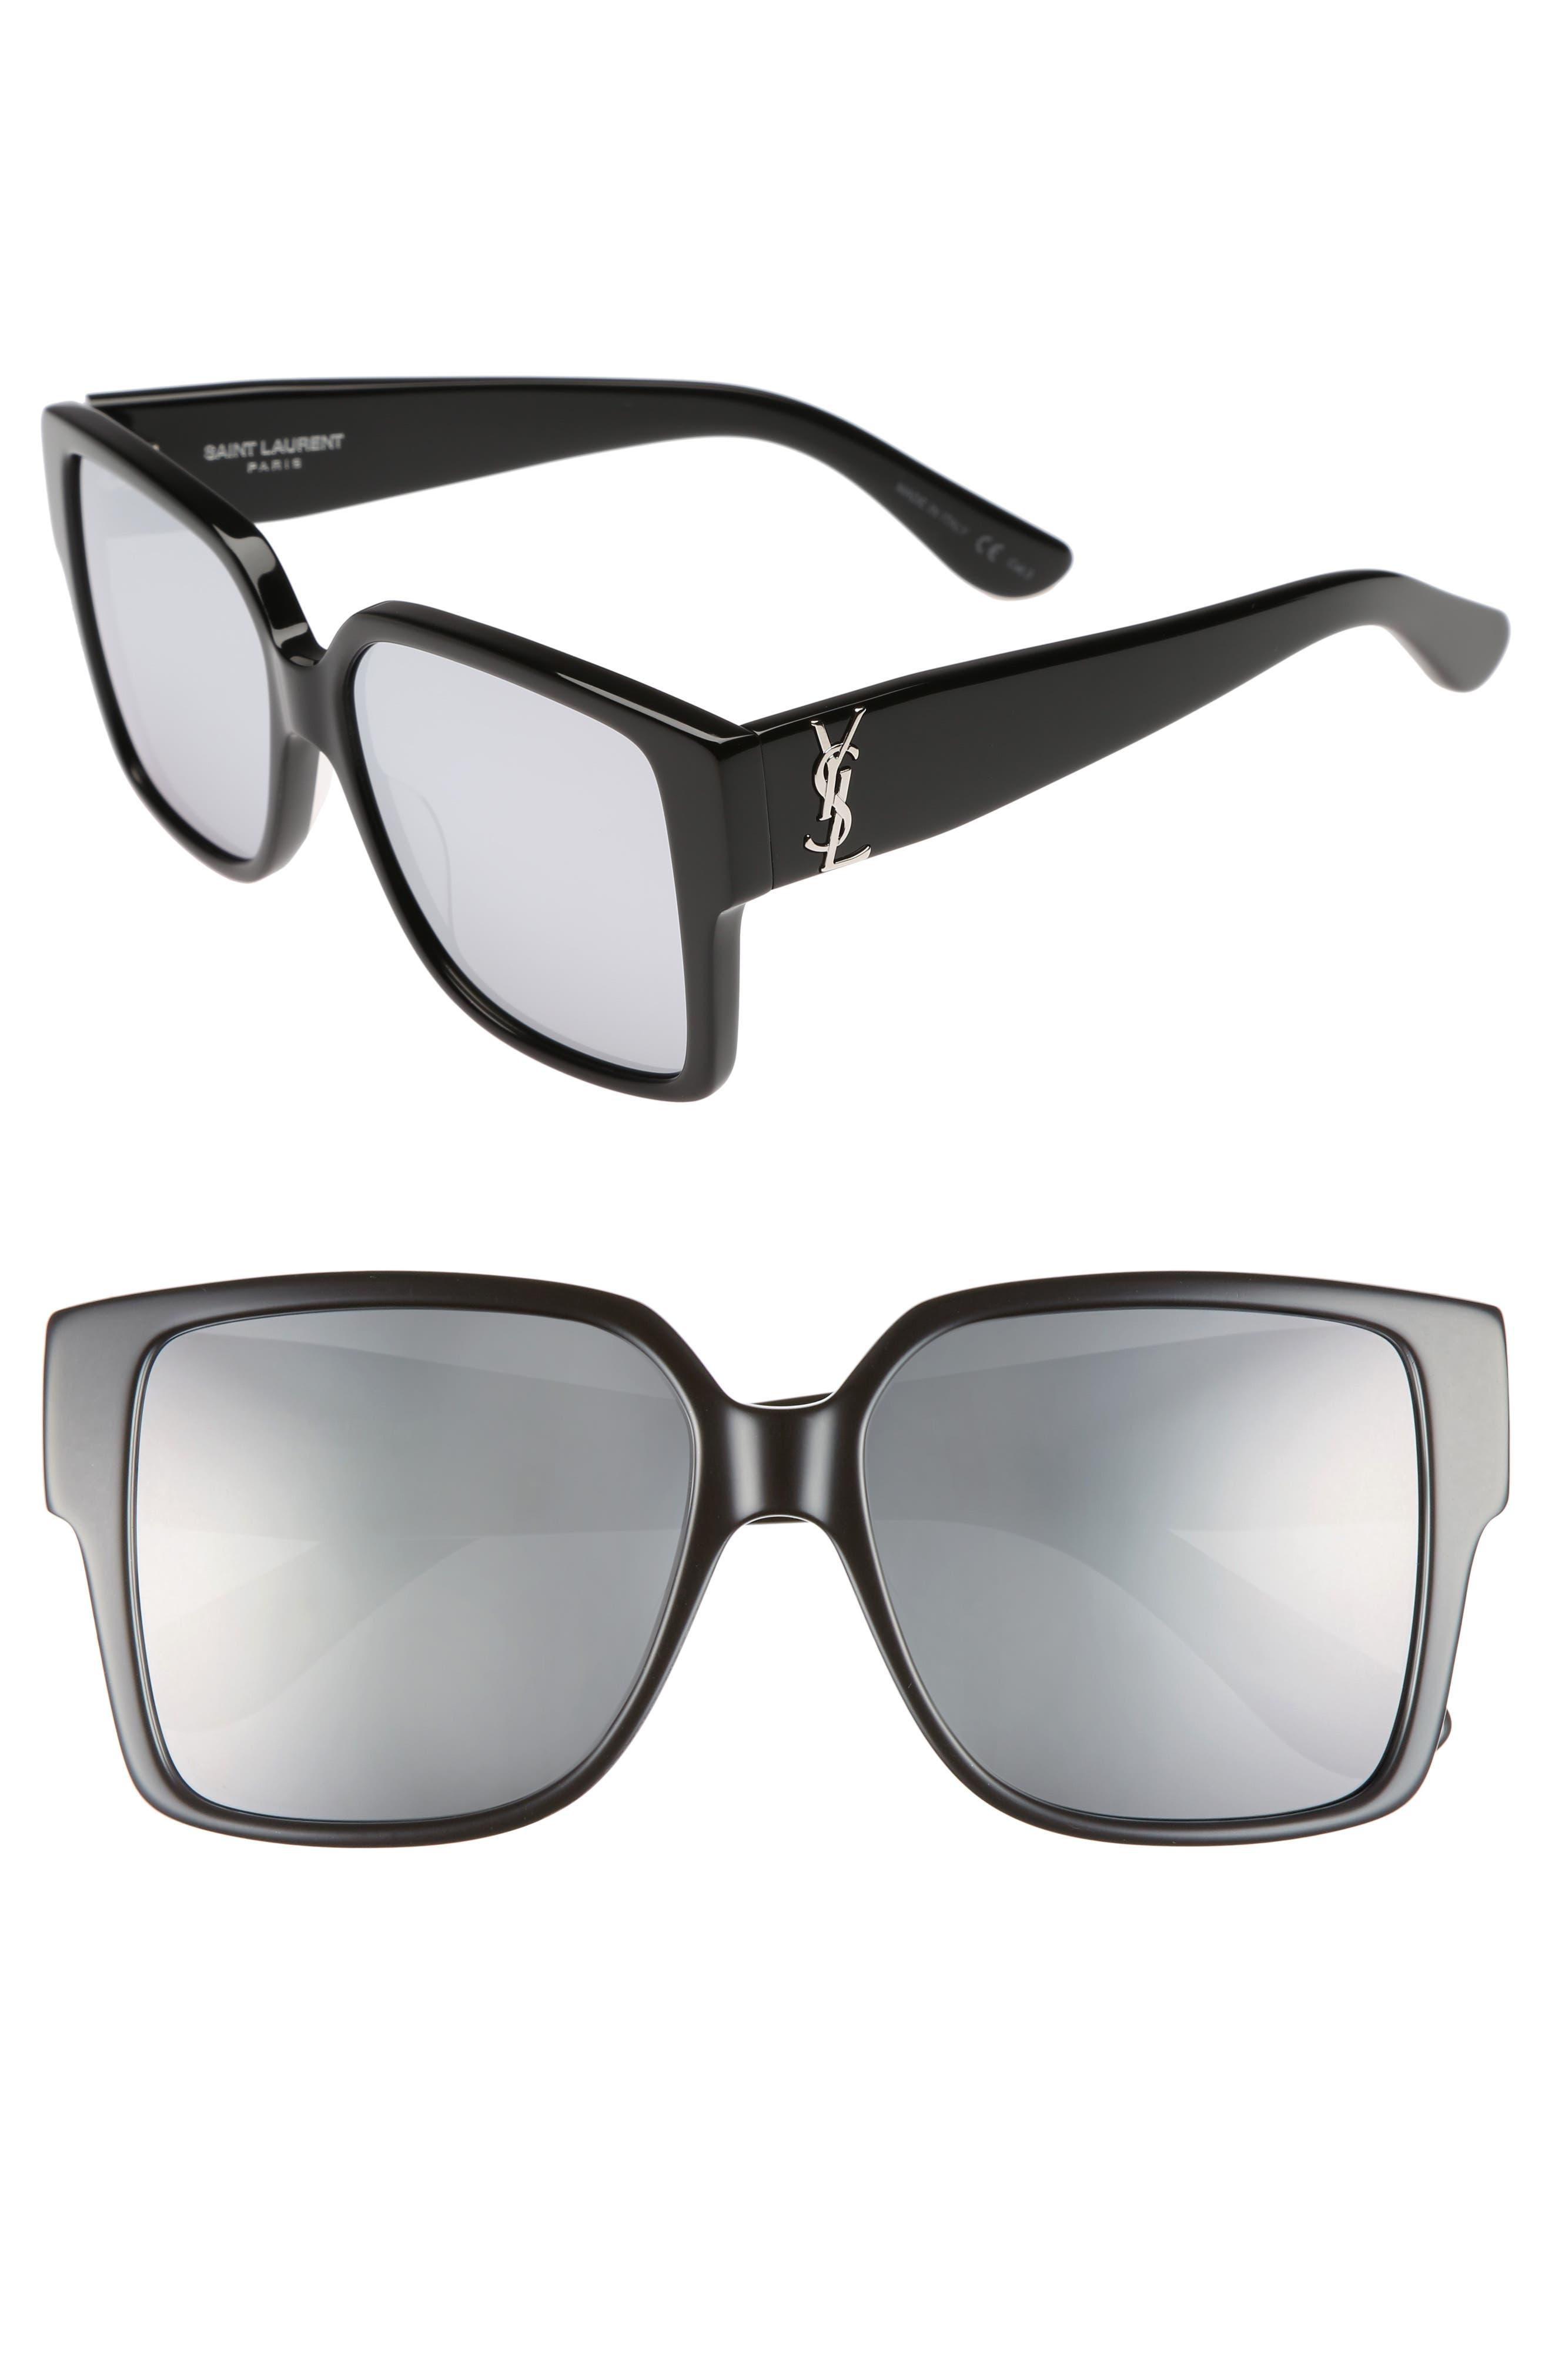 Alternate Image 1 Selected - Saint Laurent 55mm Square Sunglasses